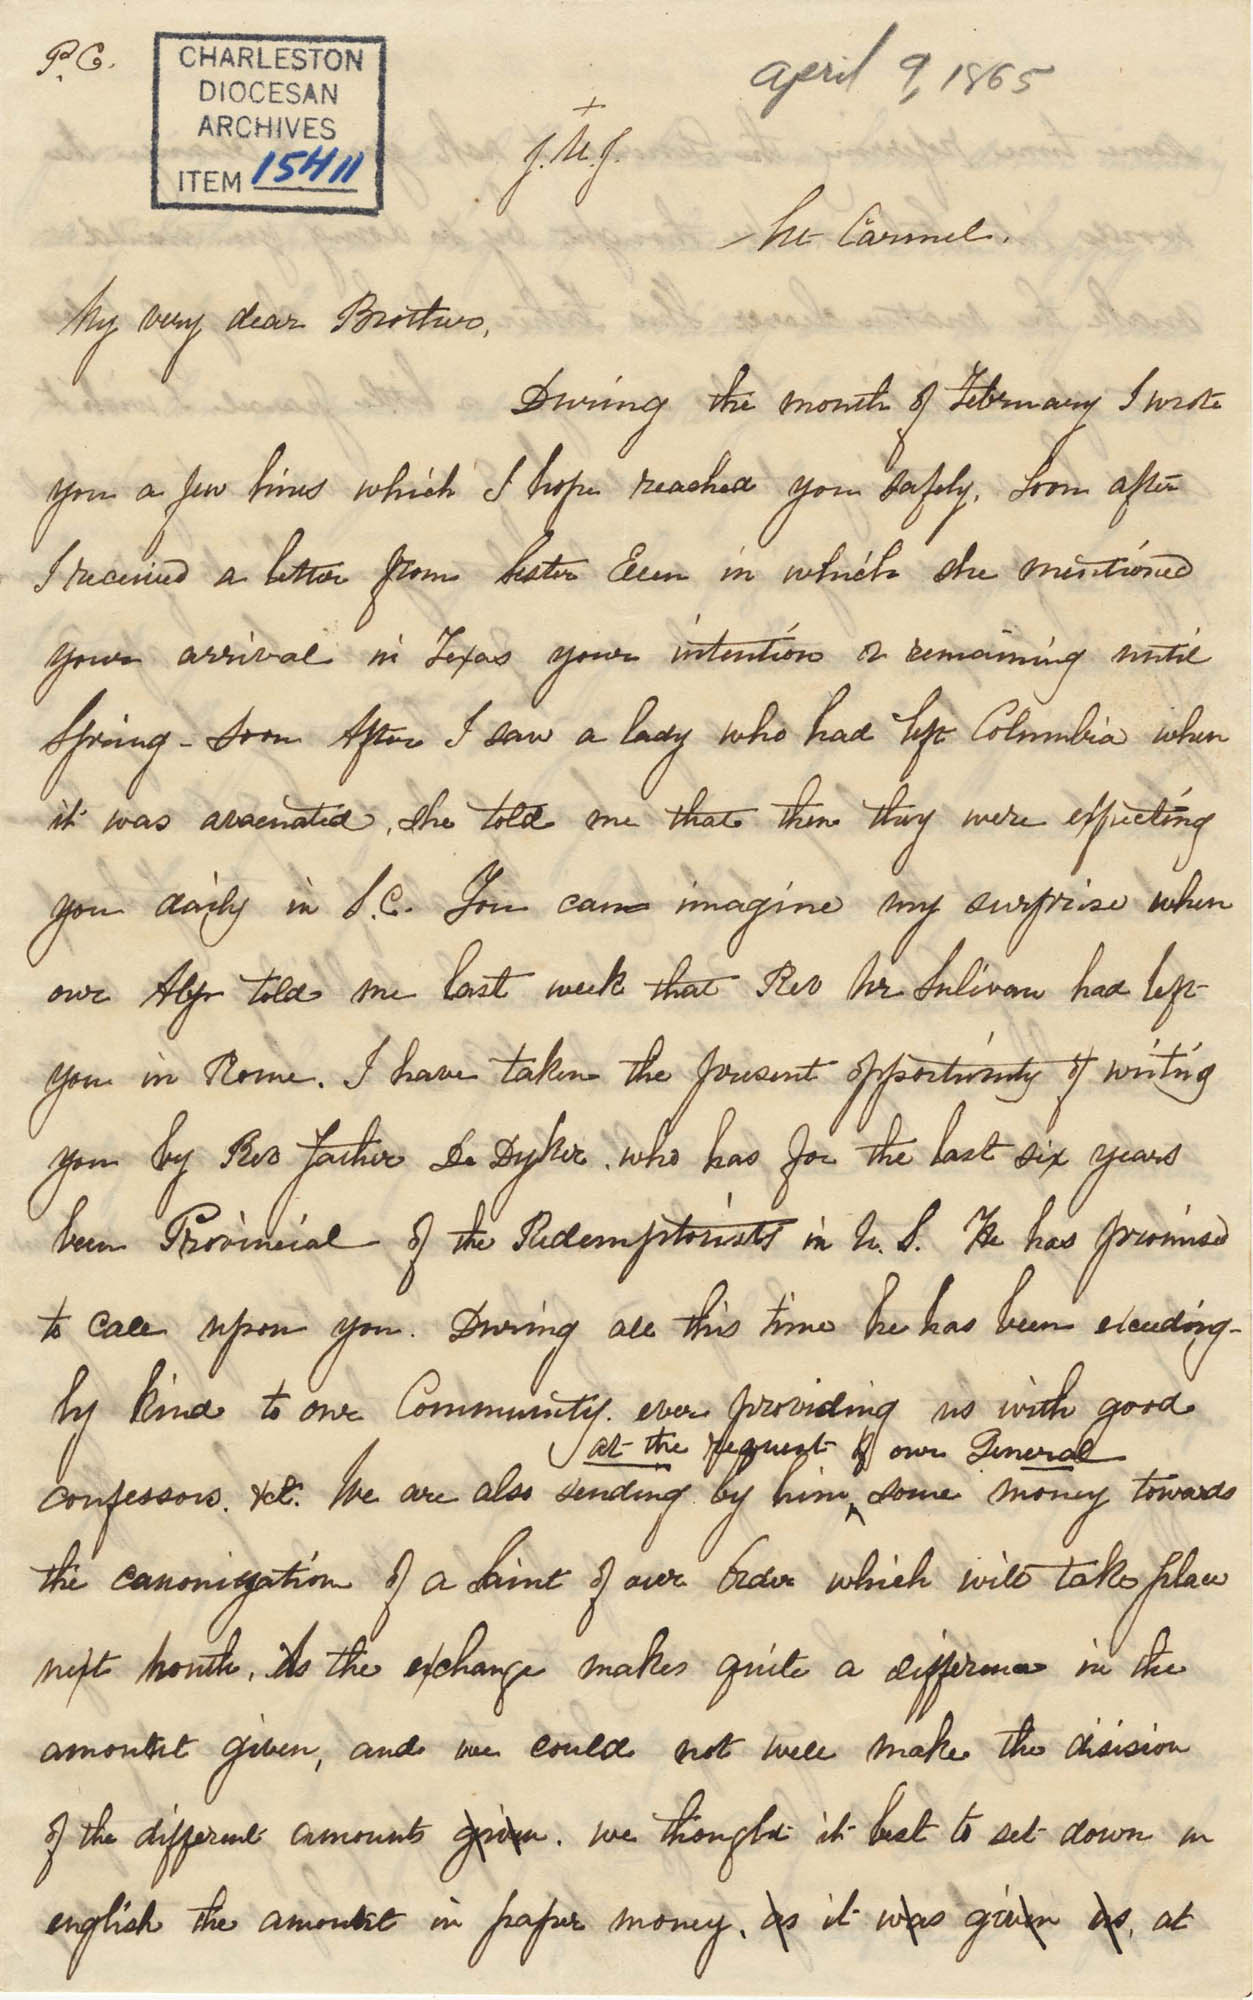 364. Madame Antonia to Bp Patrick Lynch -- April 9, 1865